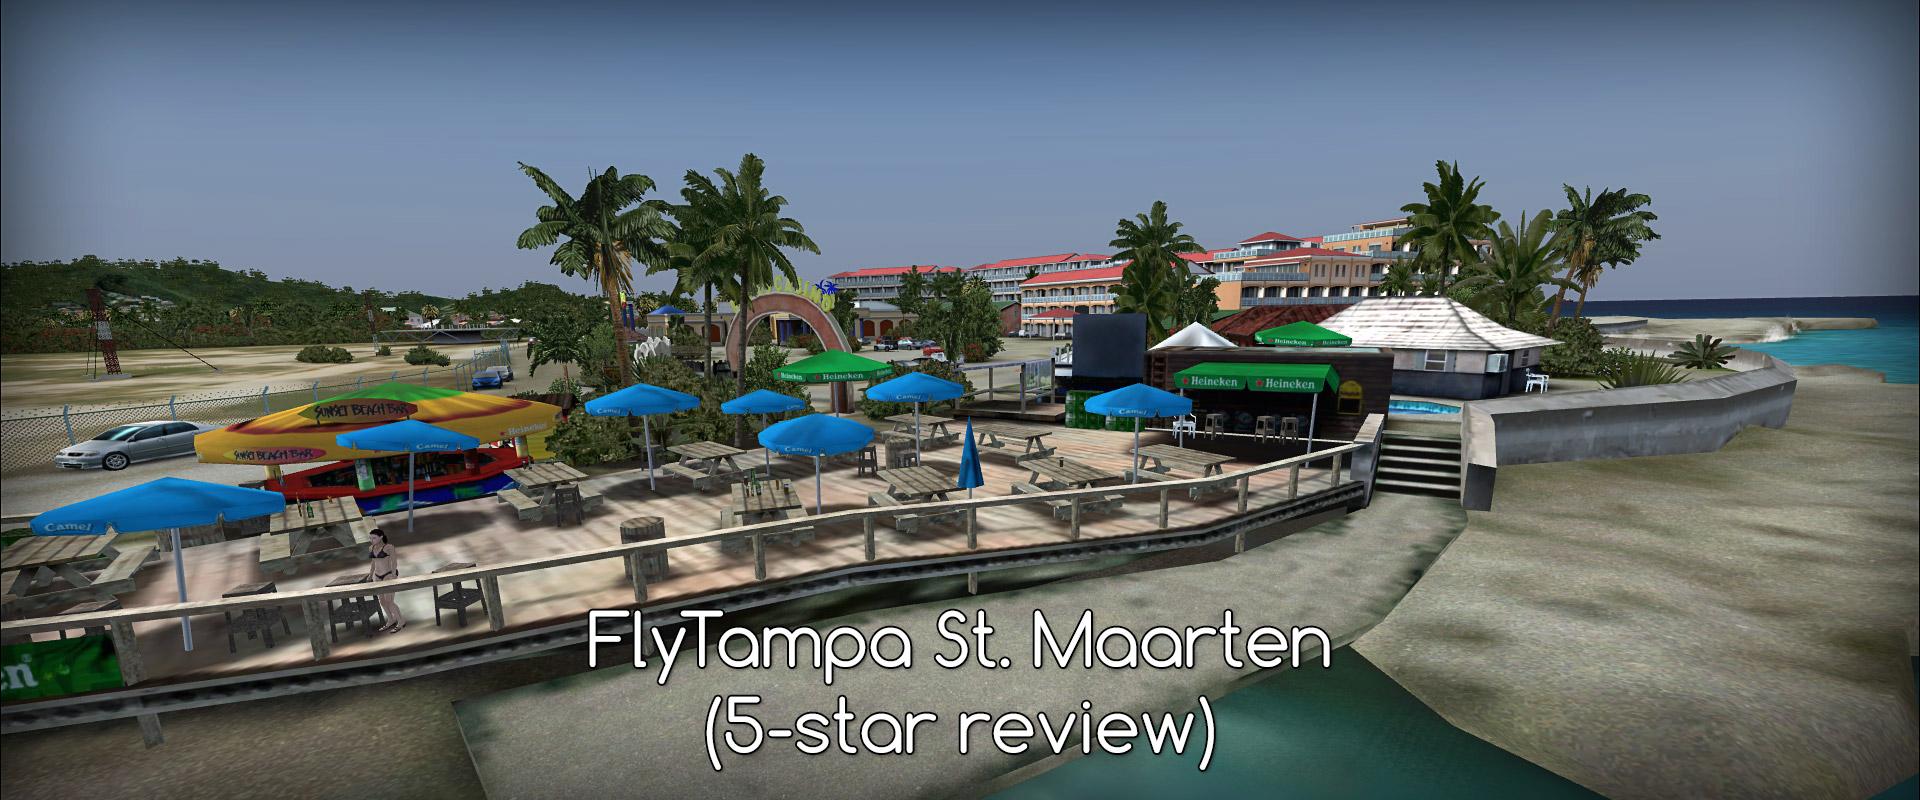 St  Maarten - FlyTampa - review (5****) • C-Aviation